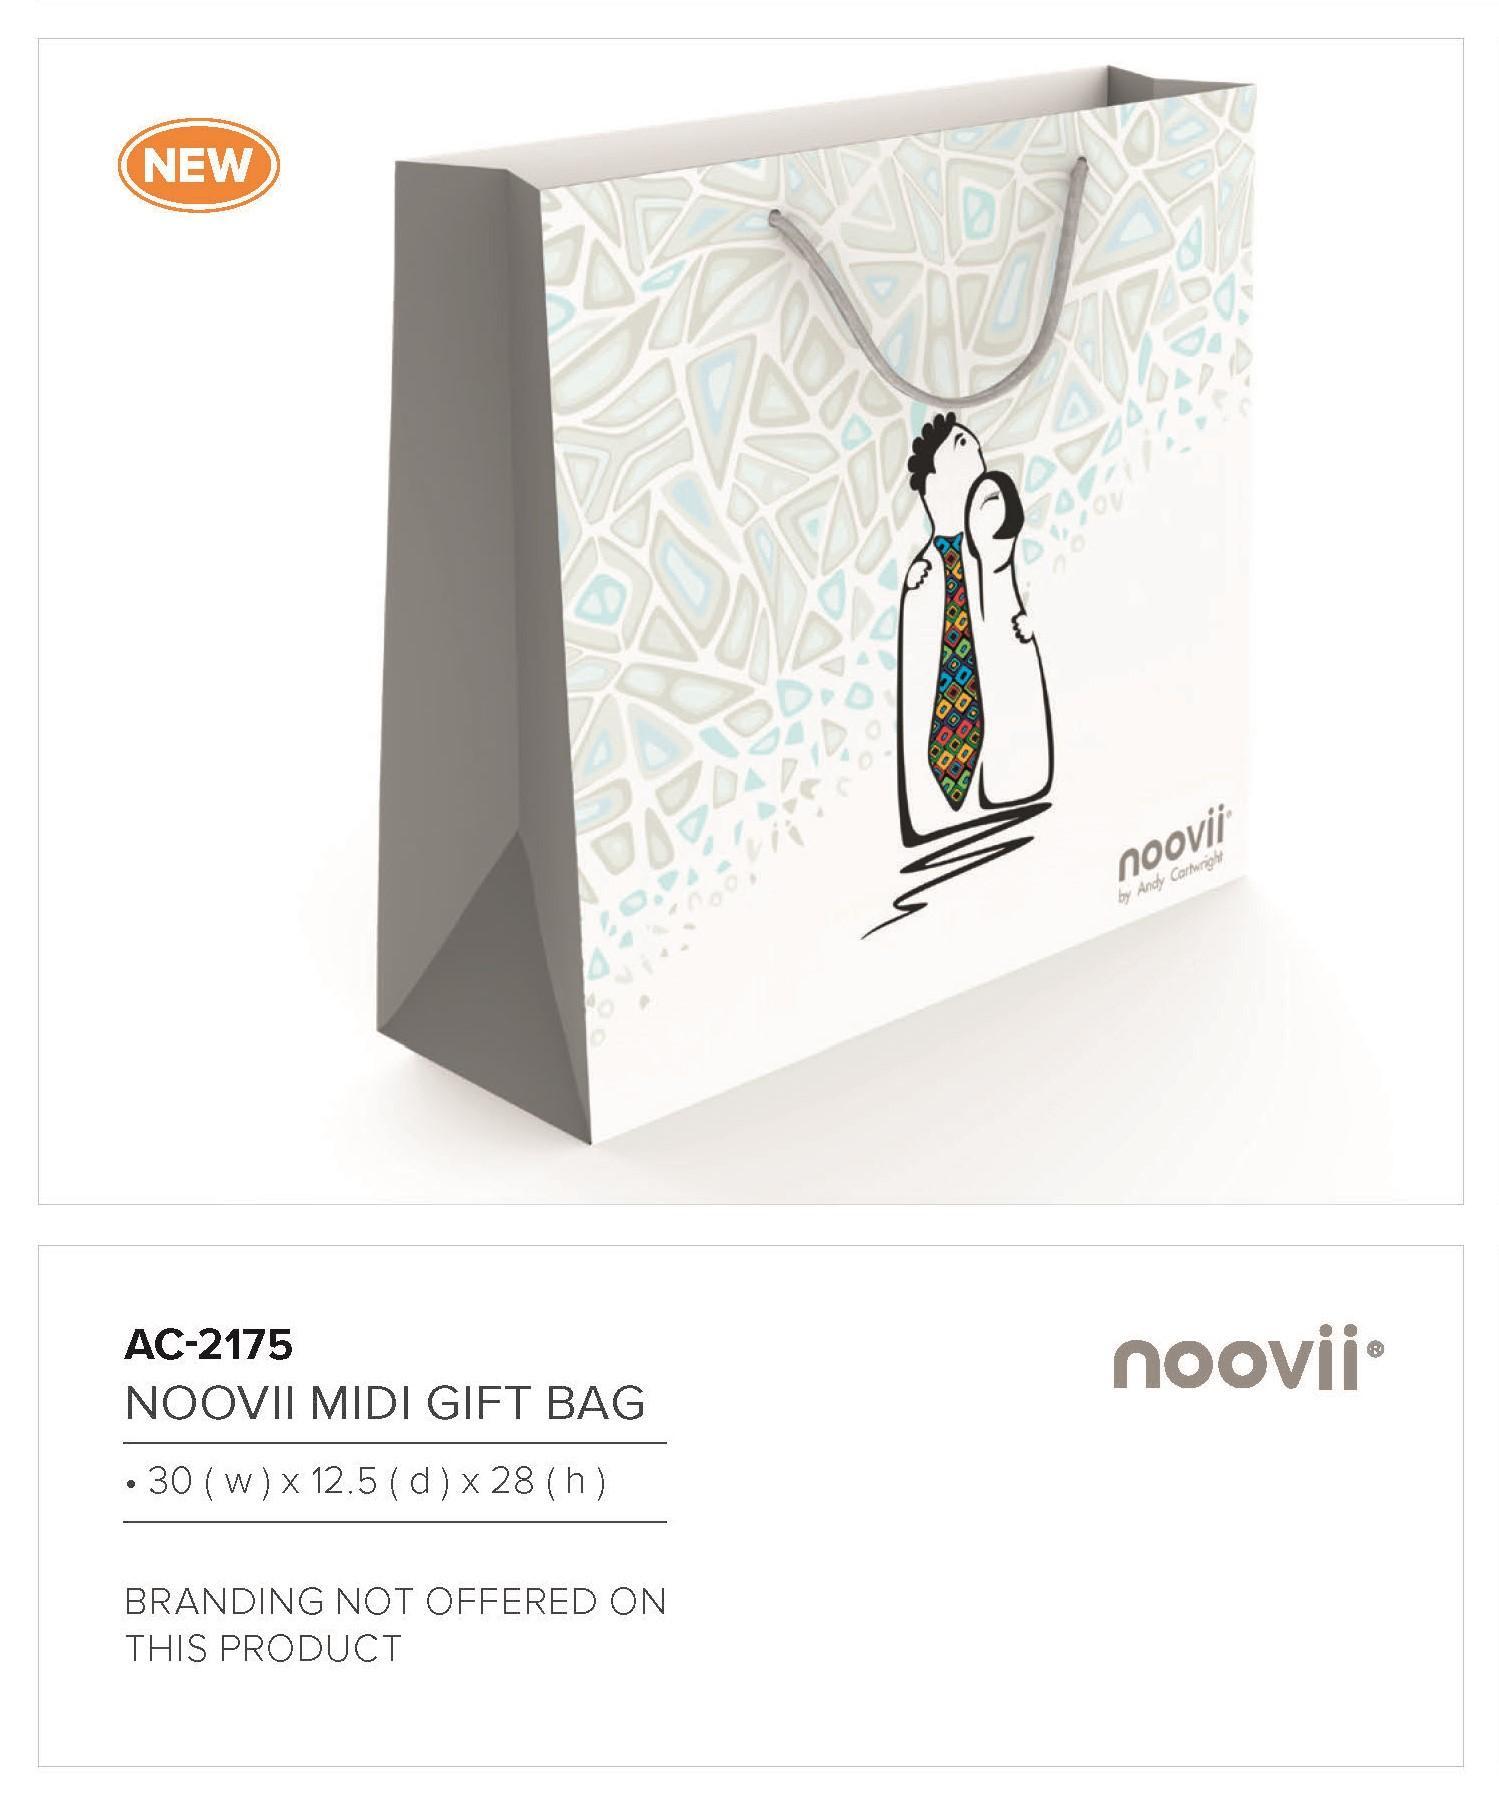 Andy Cartwright Noovii Maxi Giftbag